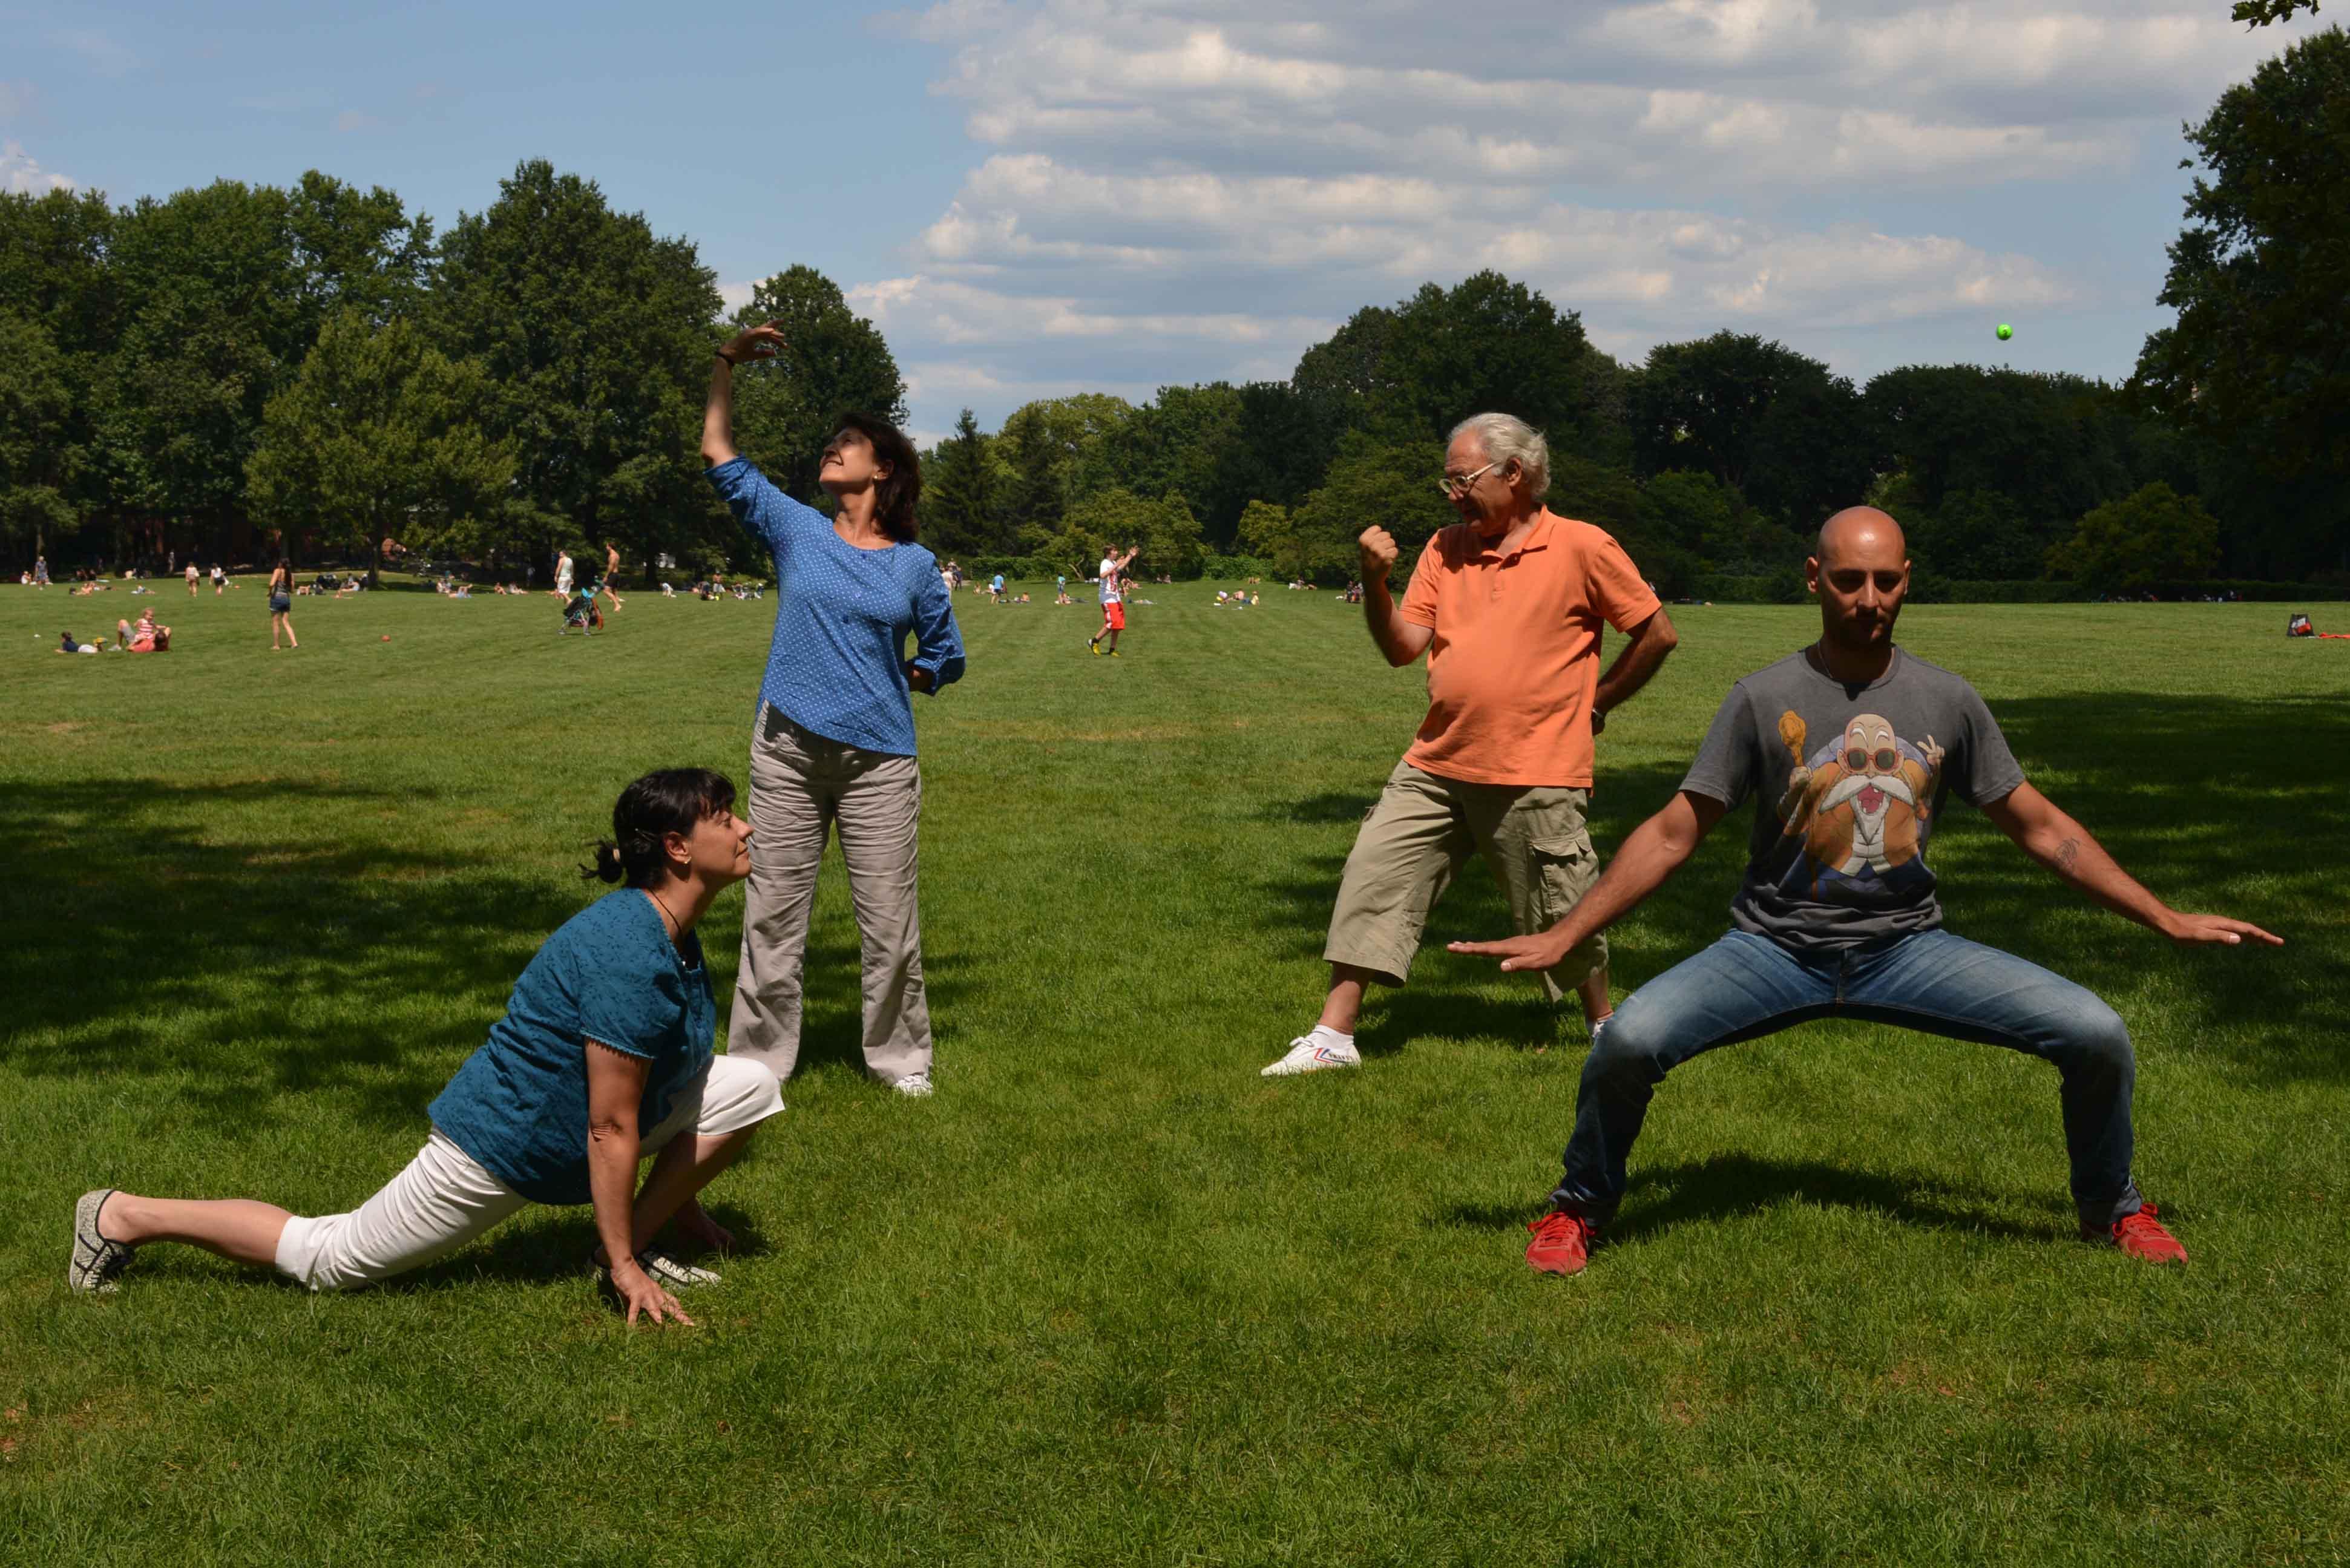 Práctica de Qigong en Central Park, Manhattan, NYC